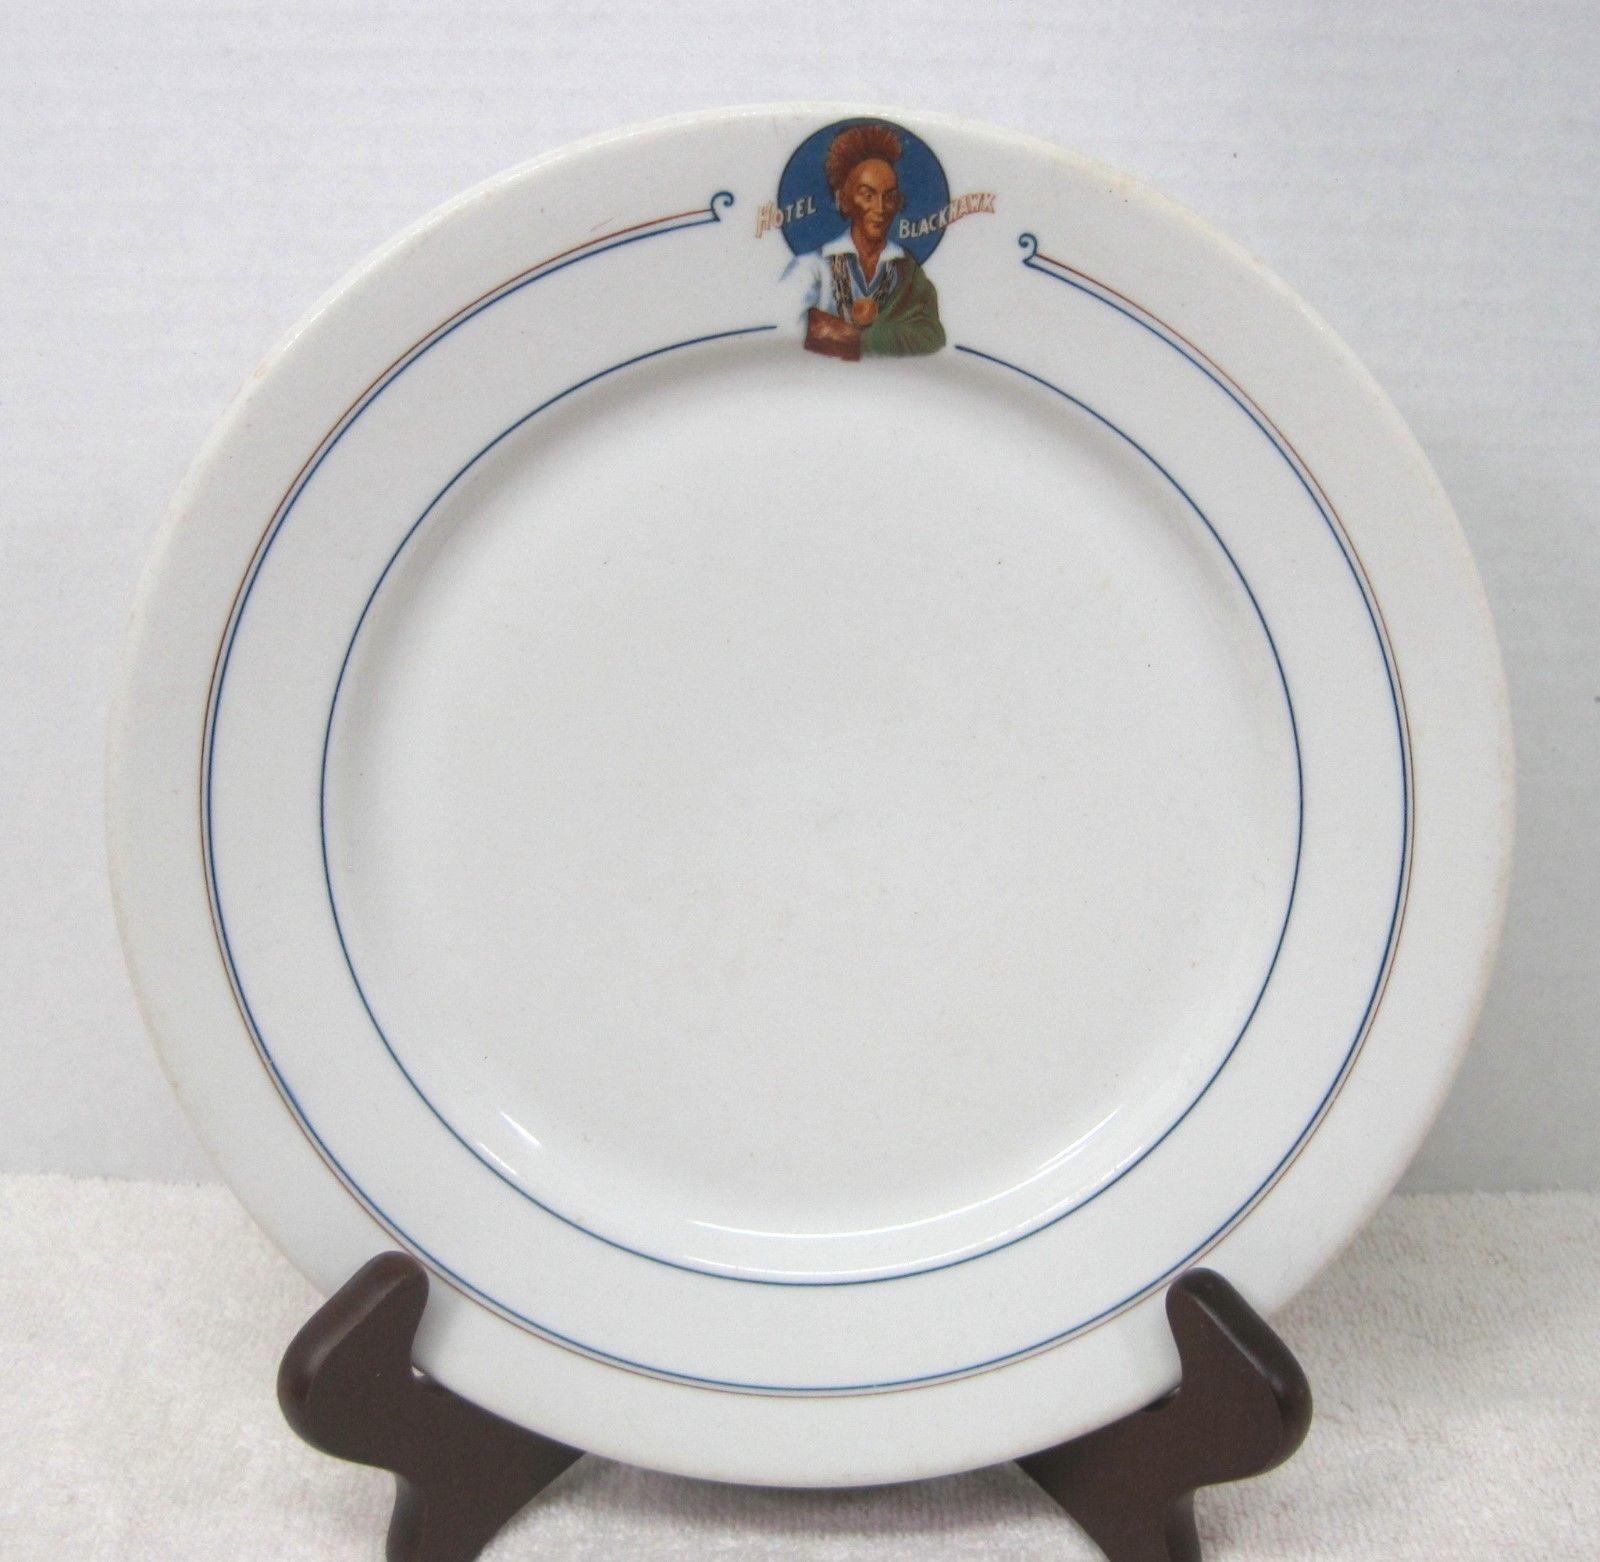 57. 57. Hotel Blackhawk 9 5/8 Inch Dinner Plate ... & Hotel Blackhawk 9 5/8 Inch Dinner Plate OPCP and 49 similar items